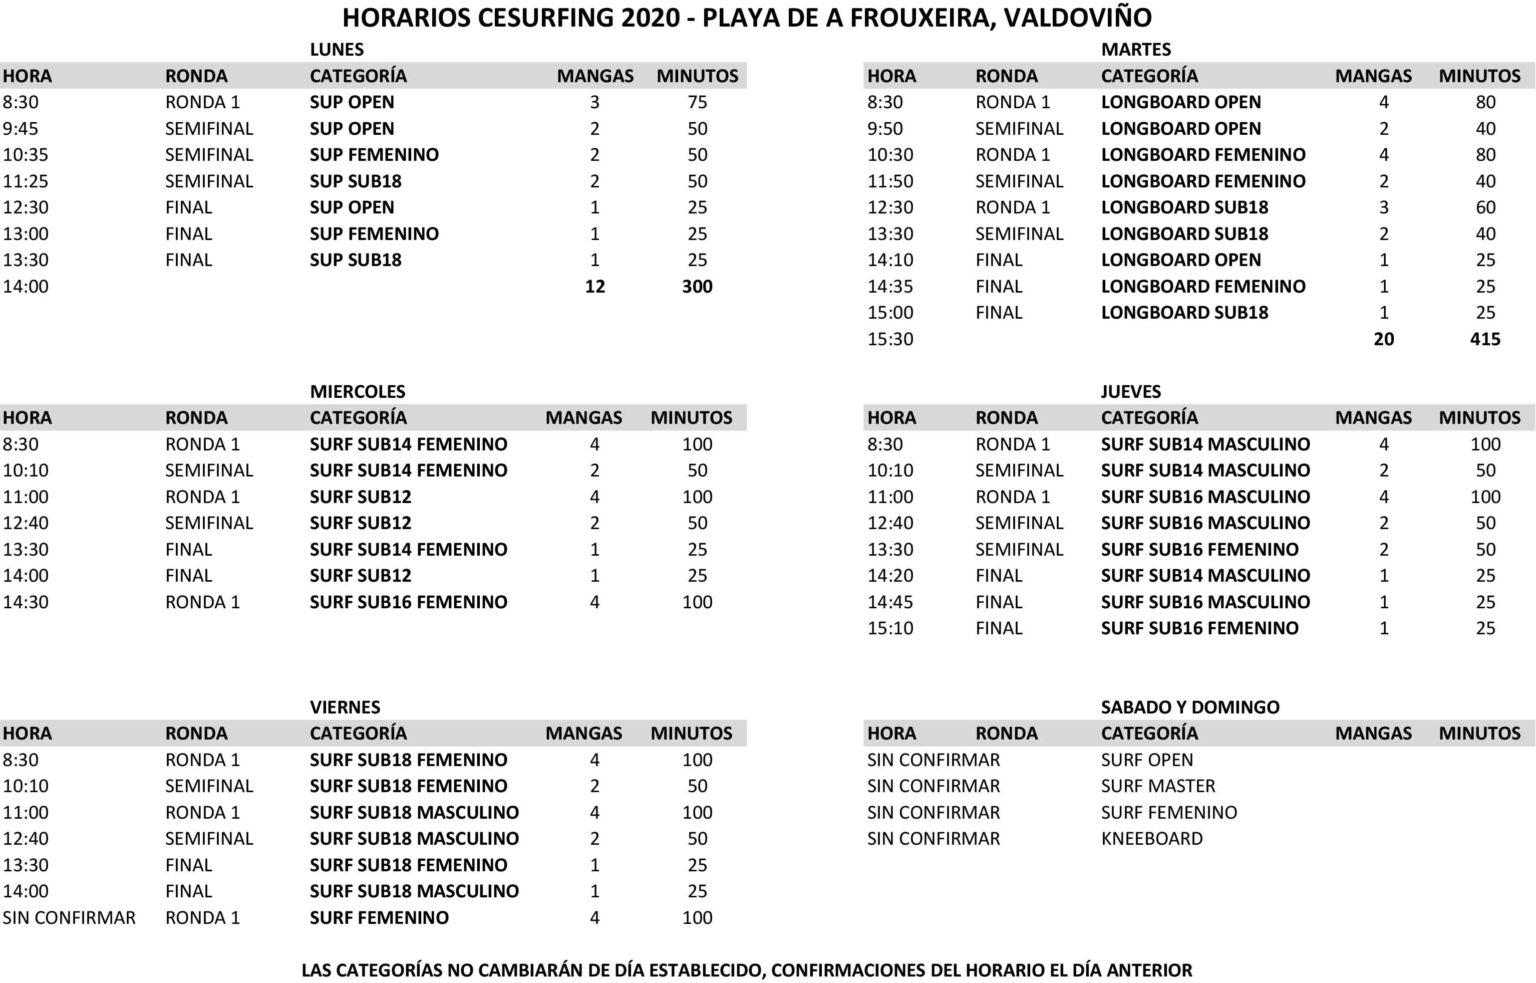 HORARIOS CESURF2020 INICIO 1536x983